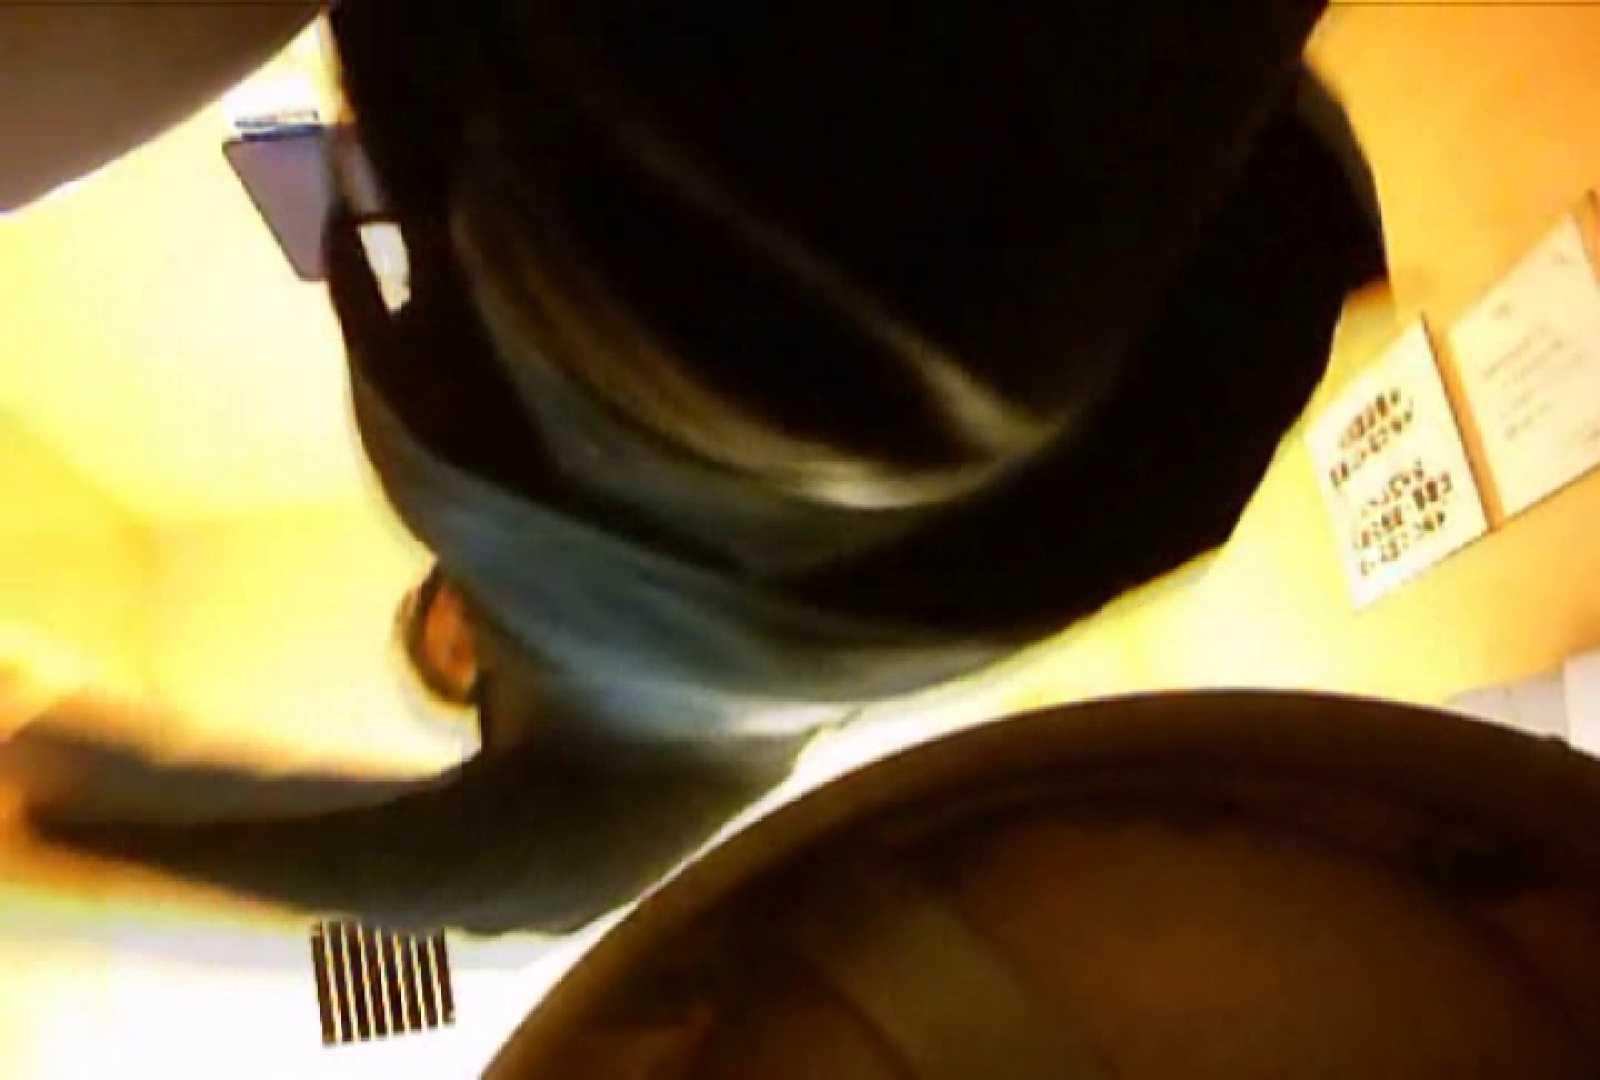 SEASON 2ND!掴み取りさんの洗面所覗き!in新幹線!VOL.02 スーツボーイズ | ノンケボーイズ  82pic 81